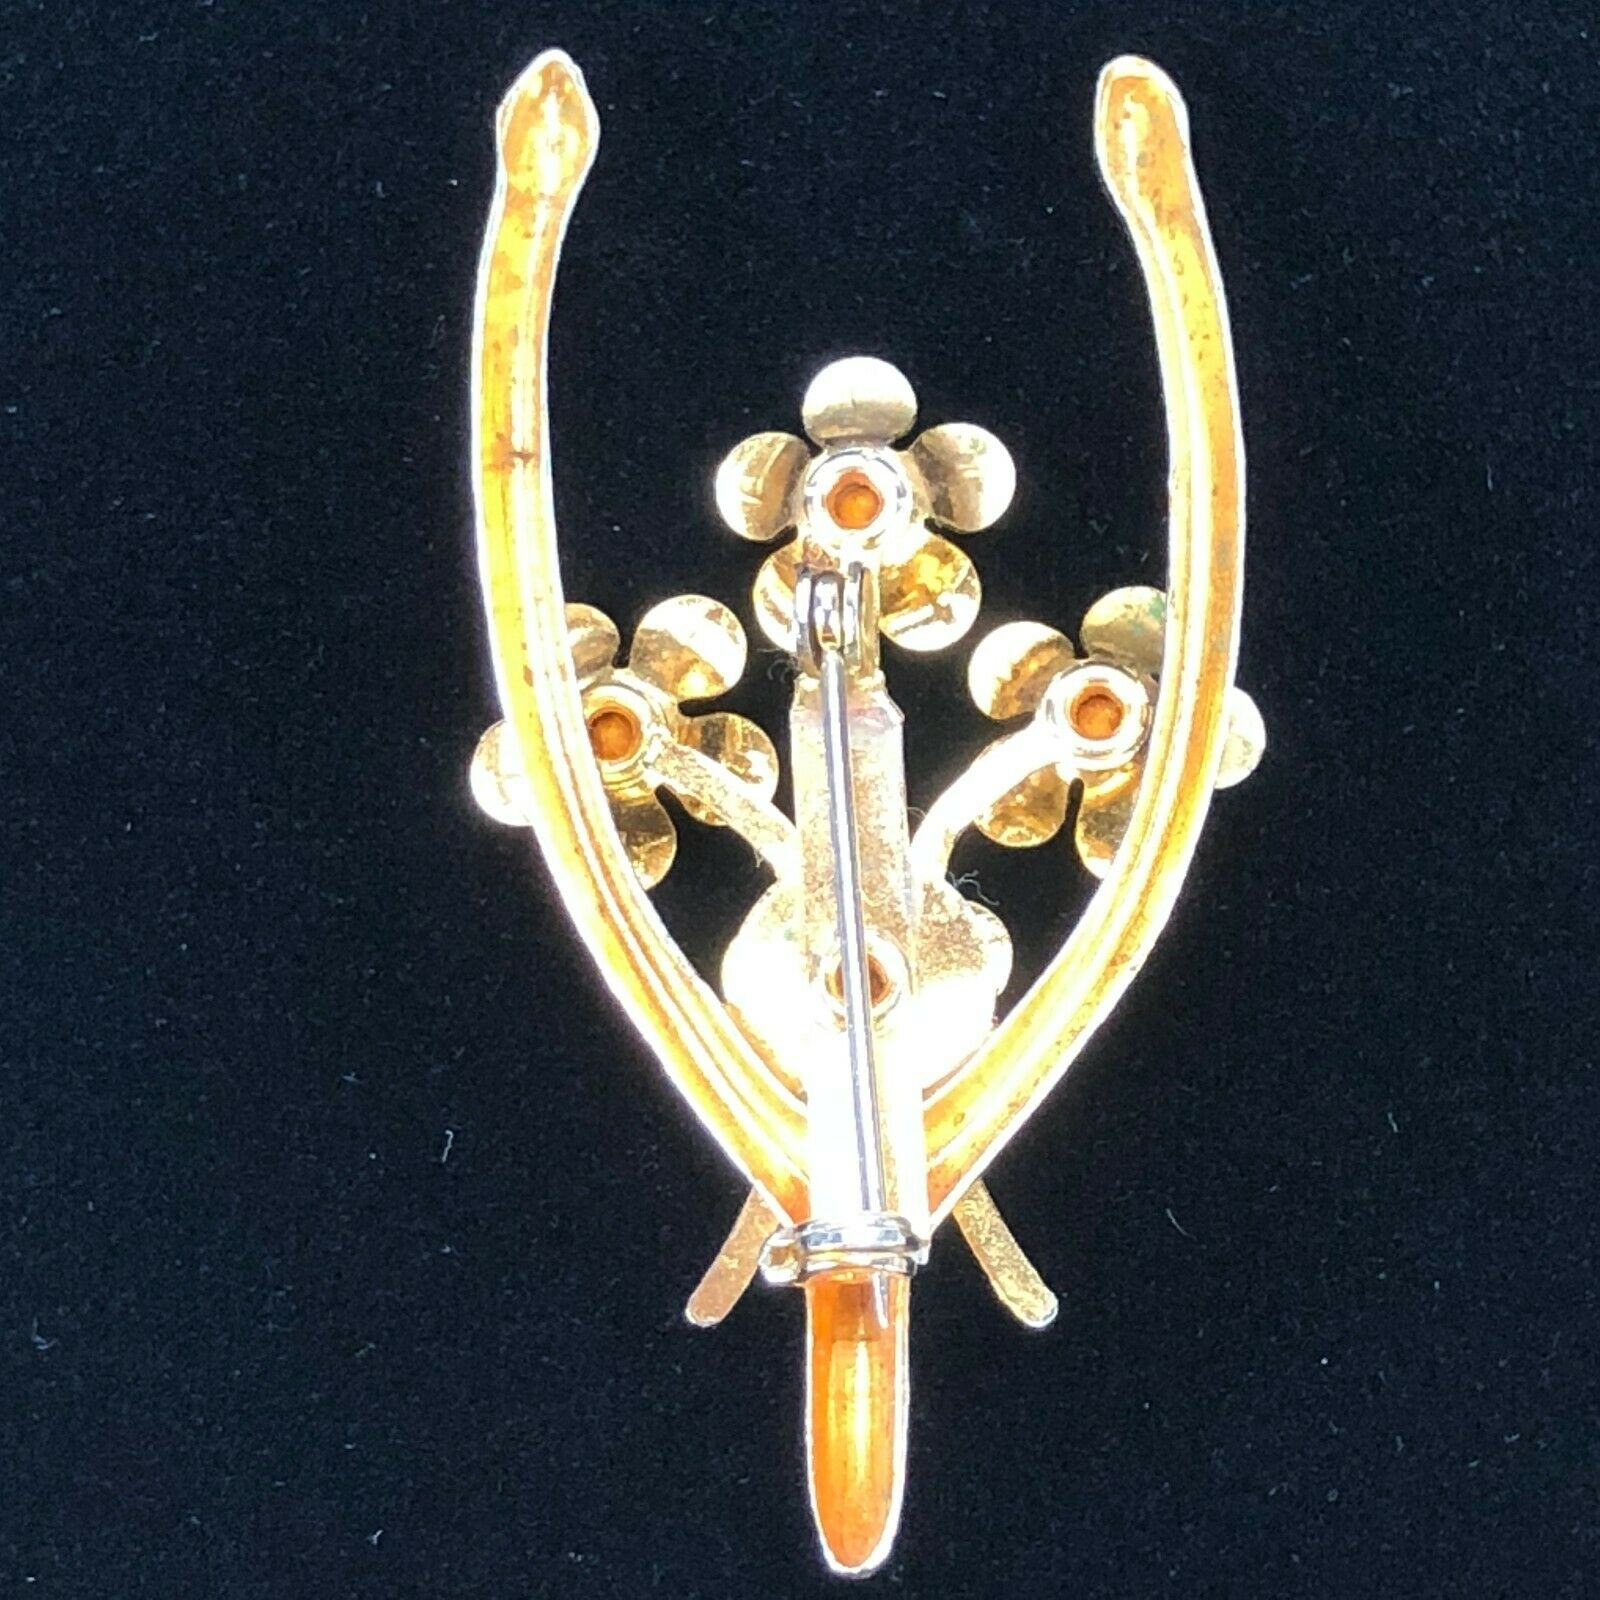 Good Luck WISHBONE Brooch Pin Delicate Lapel Jewelry Broach with Rhinestones